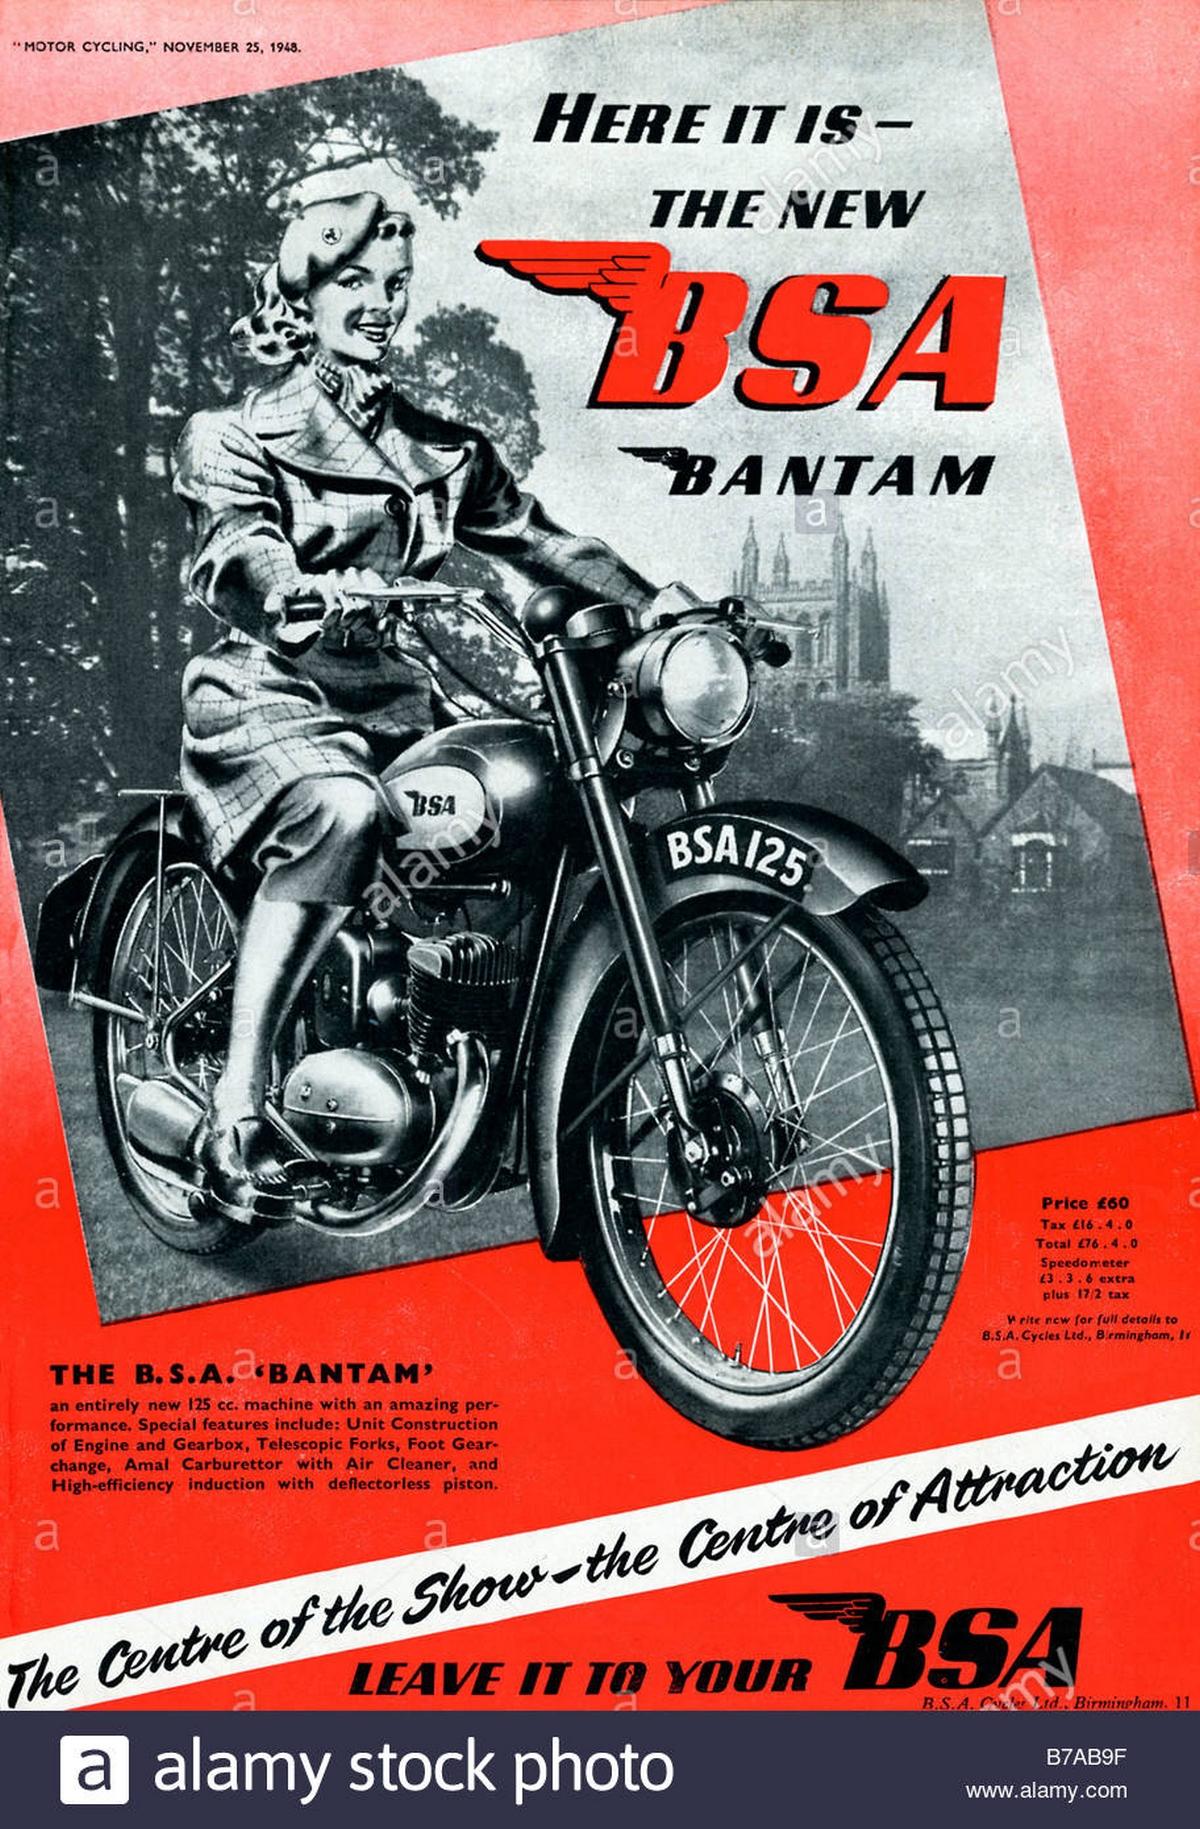 bsa-bantam-1948-advert-for-the-125cc-british-motorbike-made-in-birmingham-B7AB9F_2018-01-21.jpg